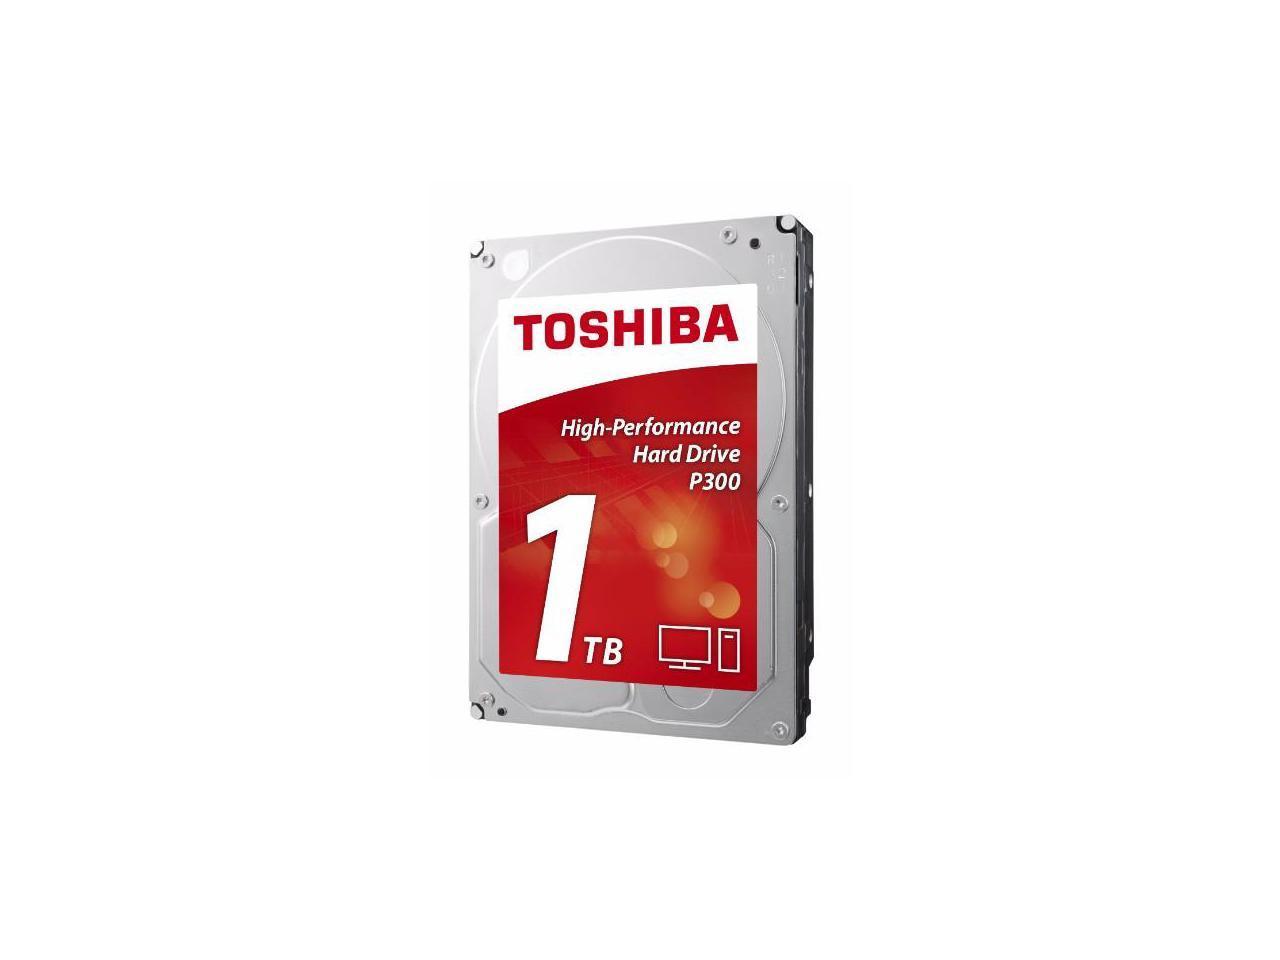 Хард диск TOSHIBA P300, 1TB, 7200rpm, 64MB, SATA 3-2